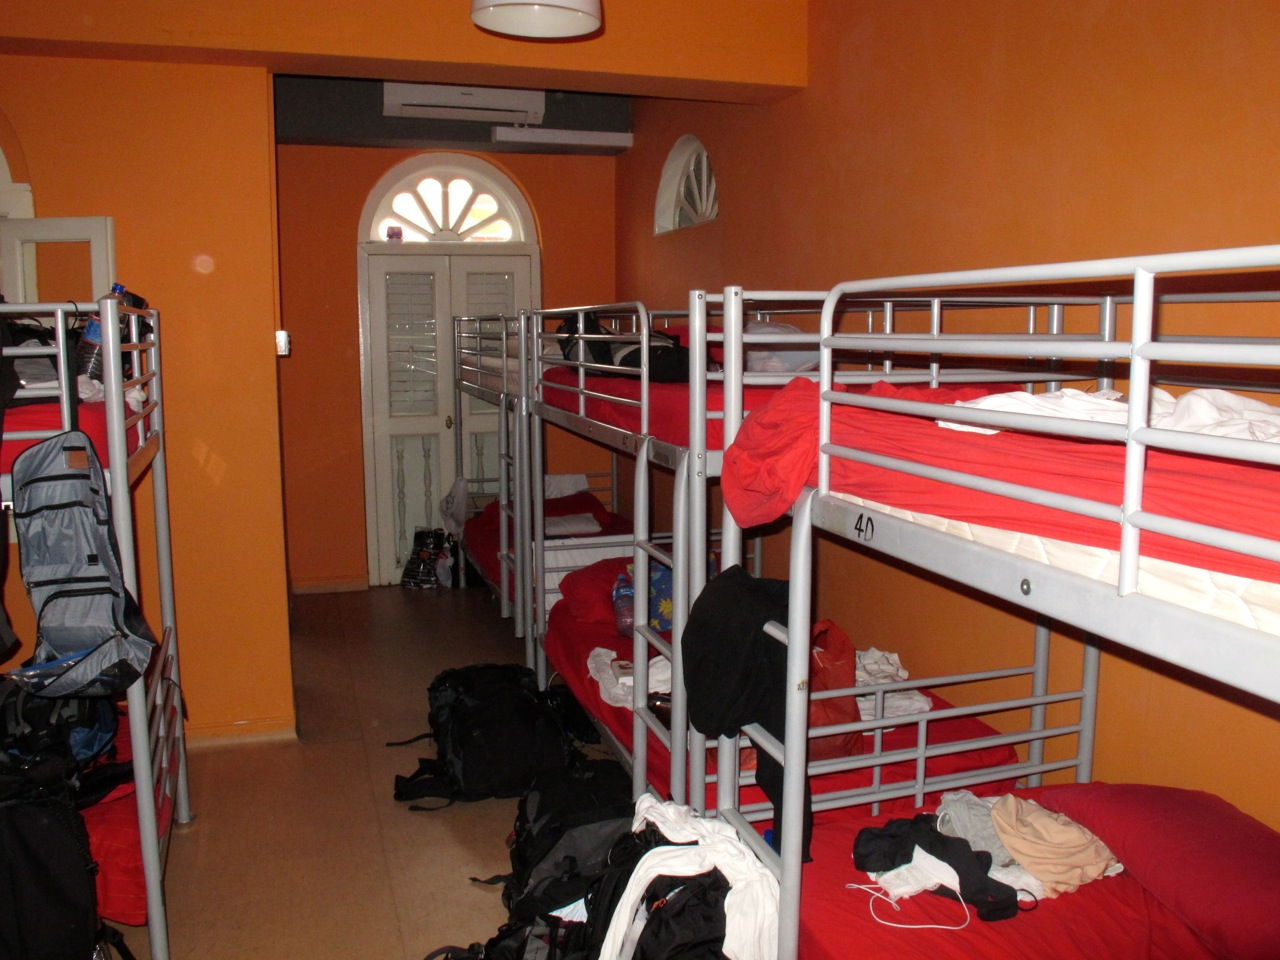 Hostel in Singapore